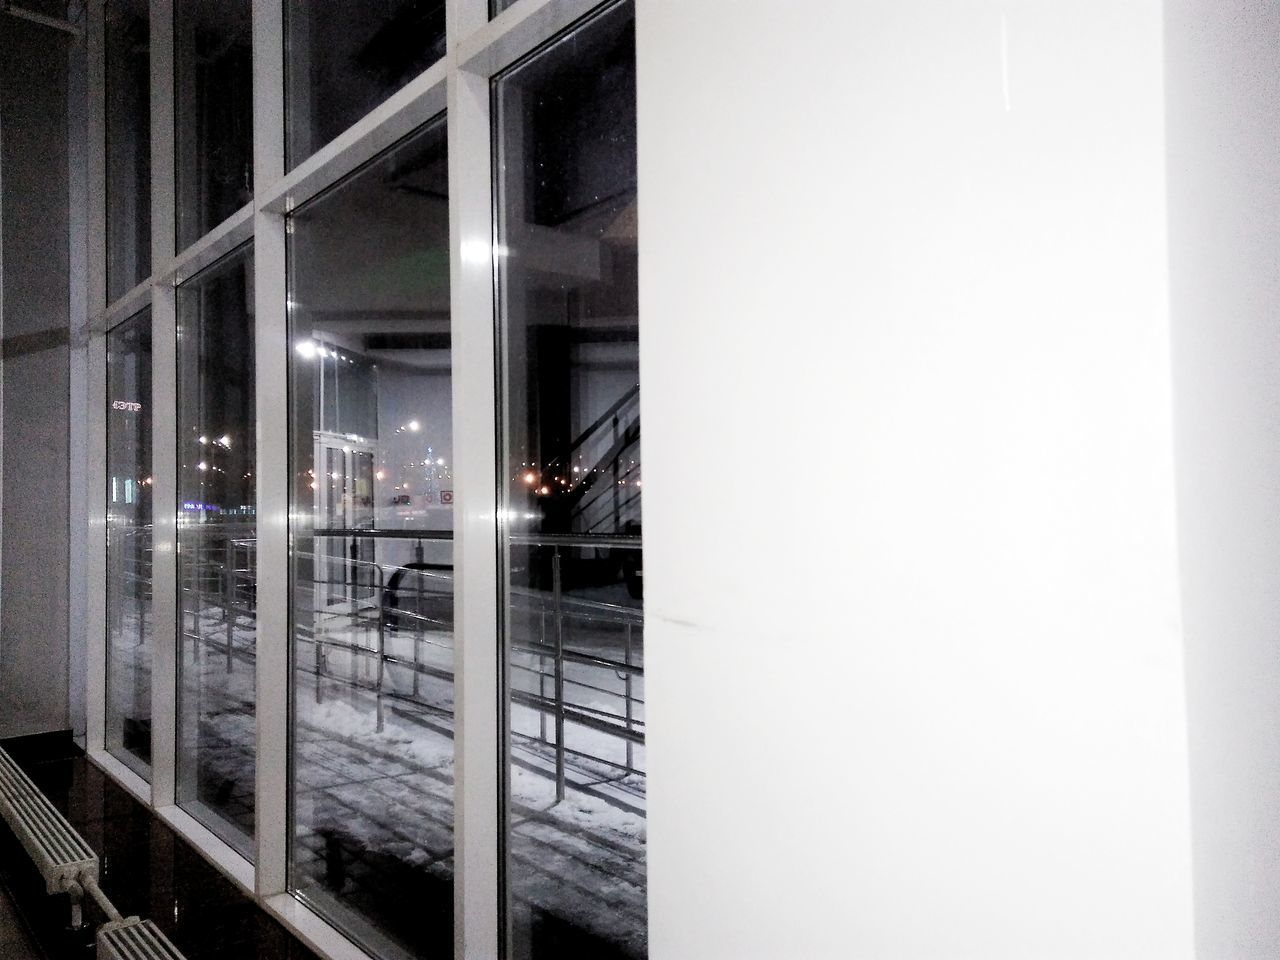 illuminated, window, night, architecture, no people, indoors